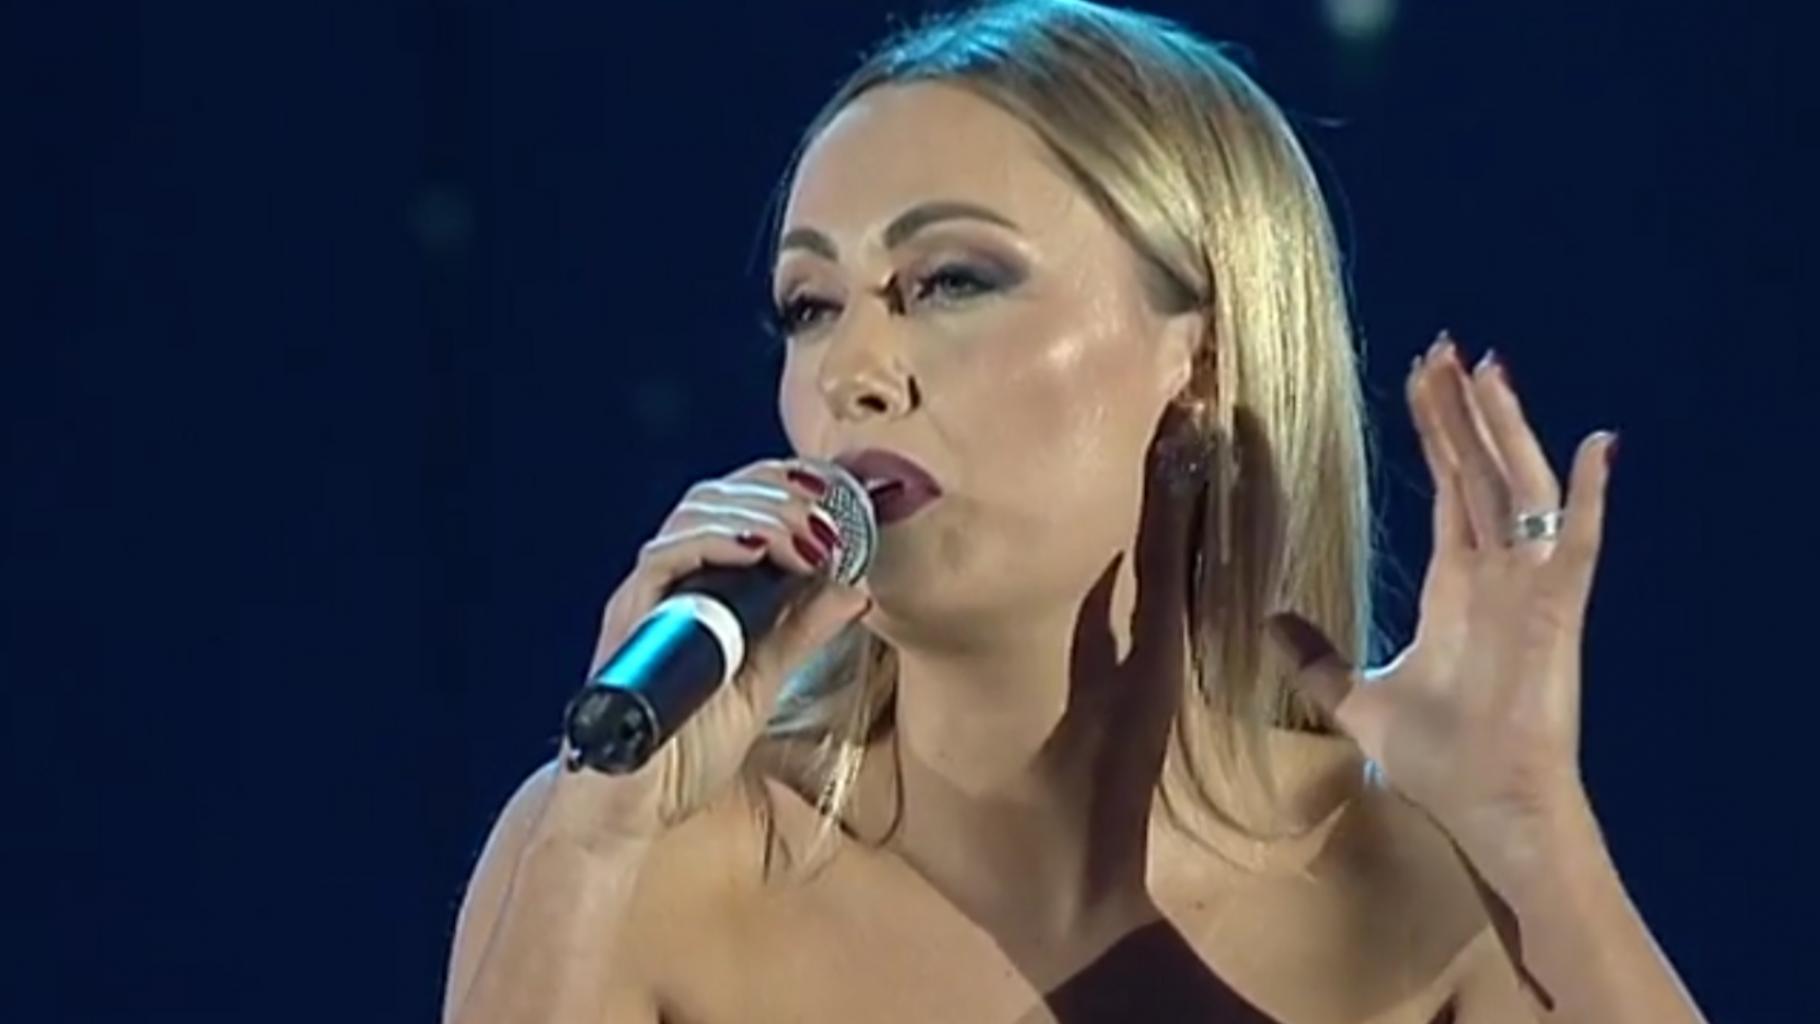 Eurovision 2016 - Albania: 'Fairytale' (Eneda Tarifa)